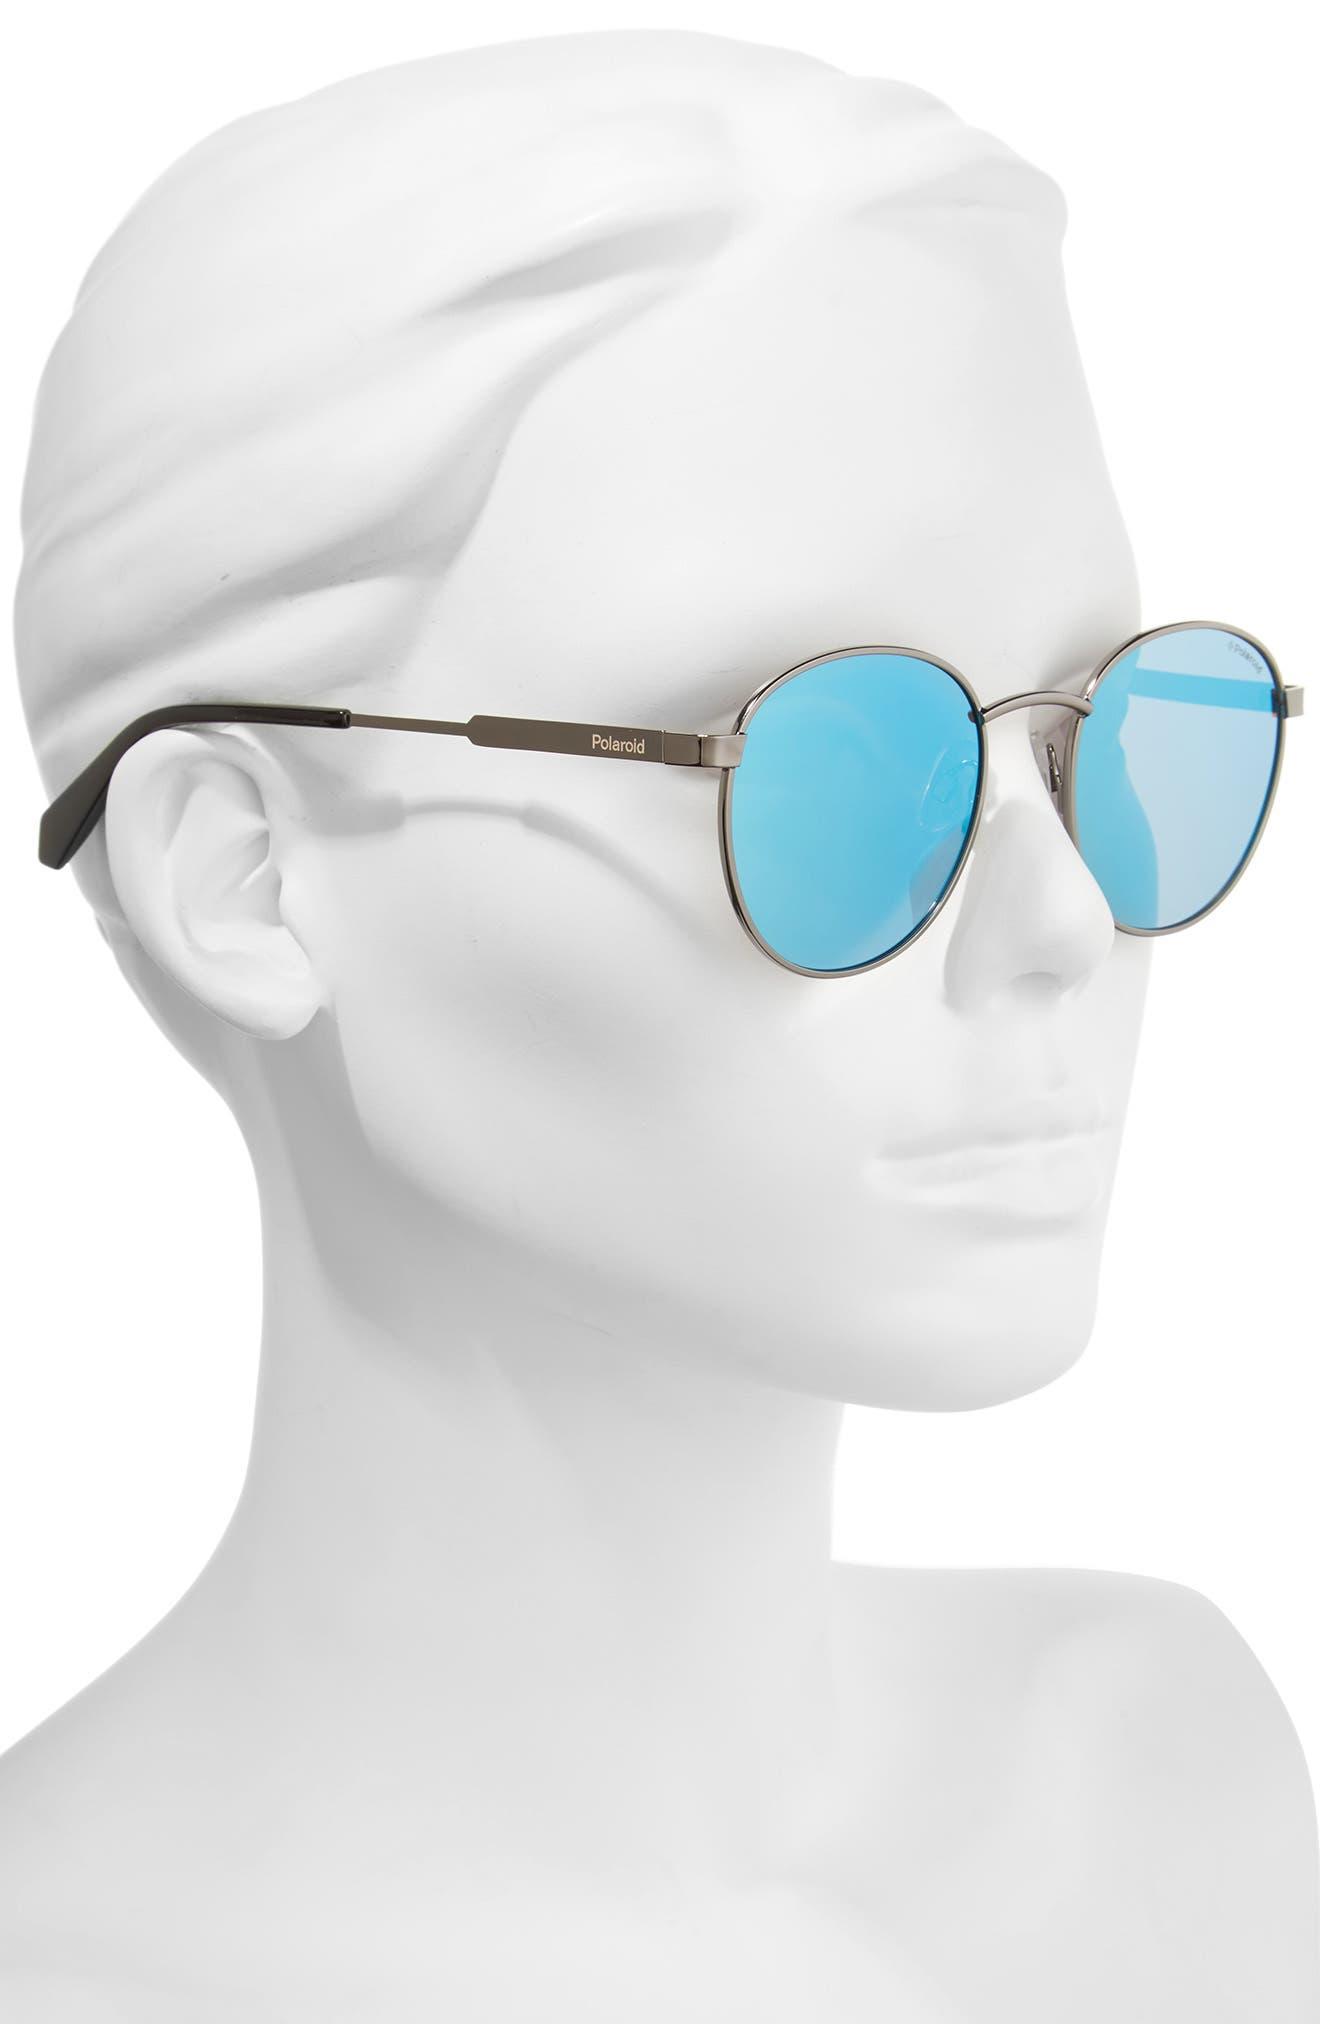 51mm Polarized Round Sunglasses,                             Alternate thumbnail 2, color,                             Ruthenium